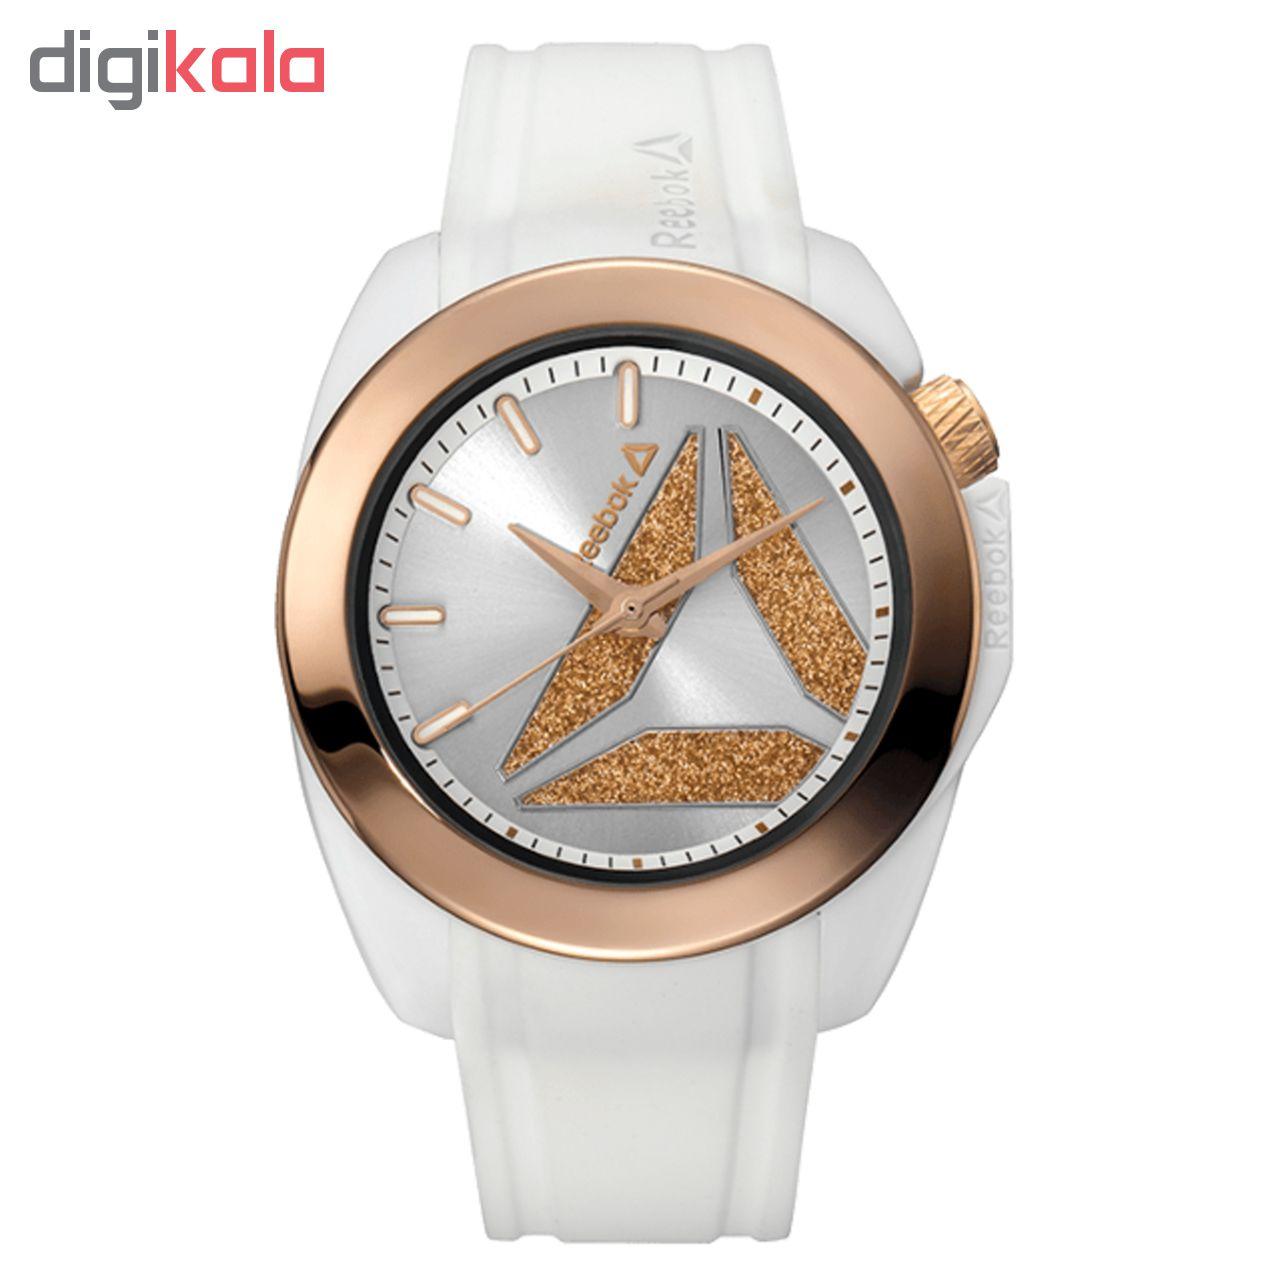 ساعت زنانه برند ریباک مدل RD-DIA-L2-PWIW-13